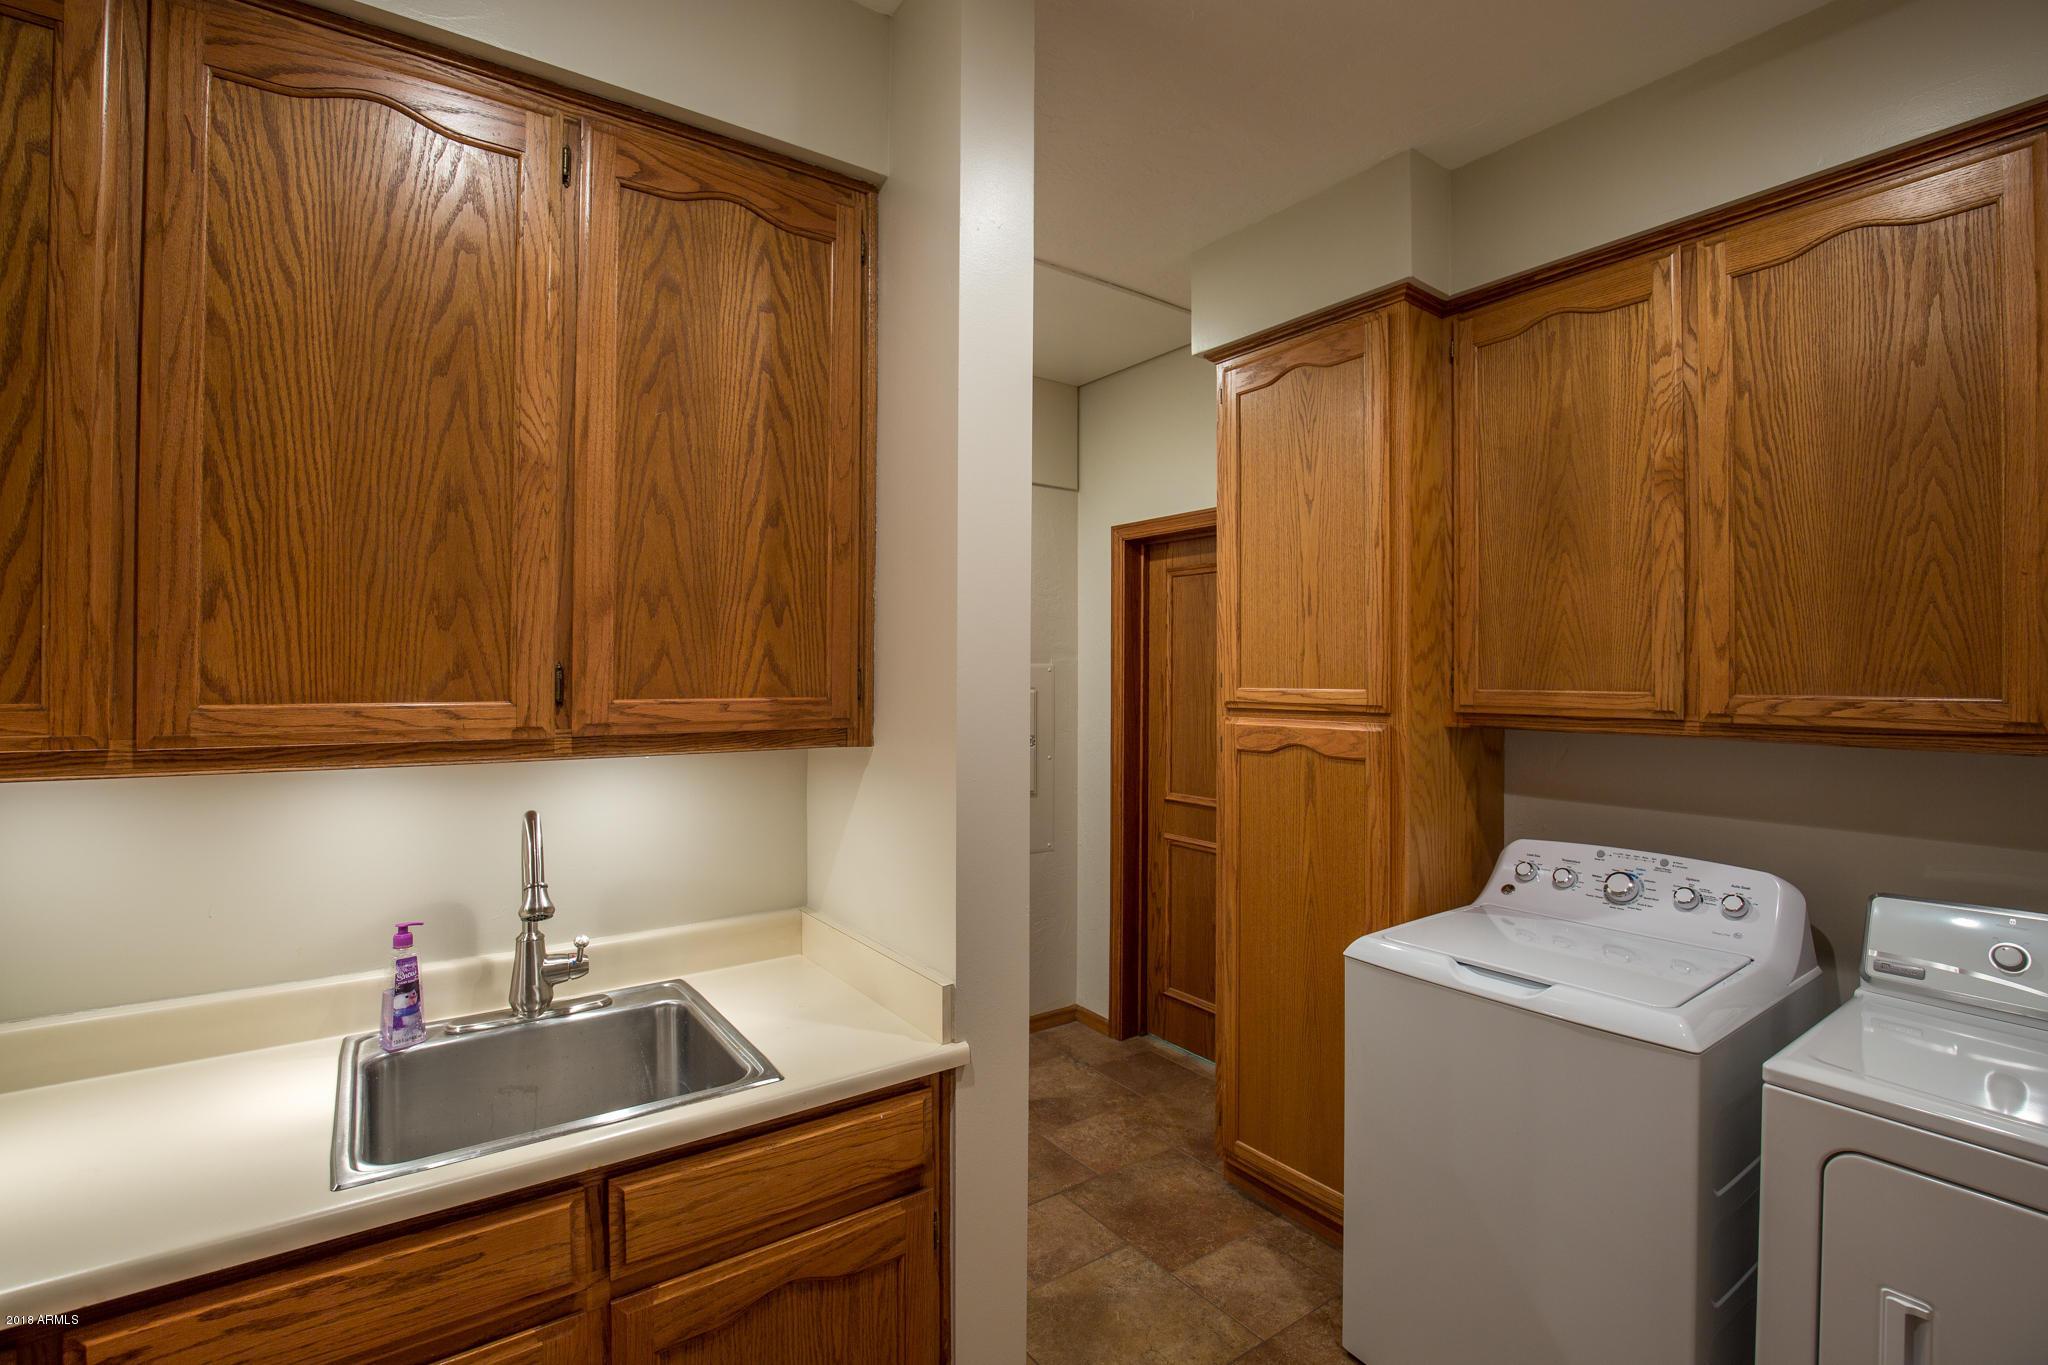 MLS 5763901 691 E HOUSTON Avenue, Gilbert, AZ 85234 Gilbert AZ Circle G Ranches